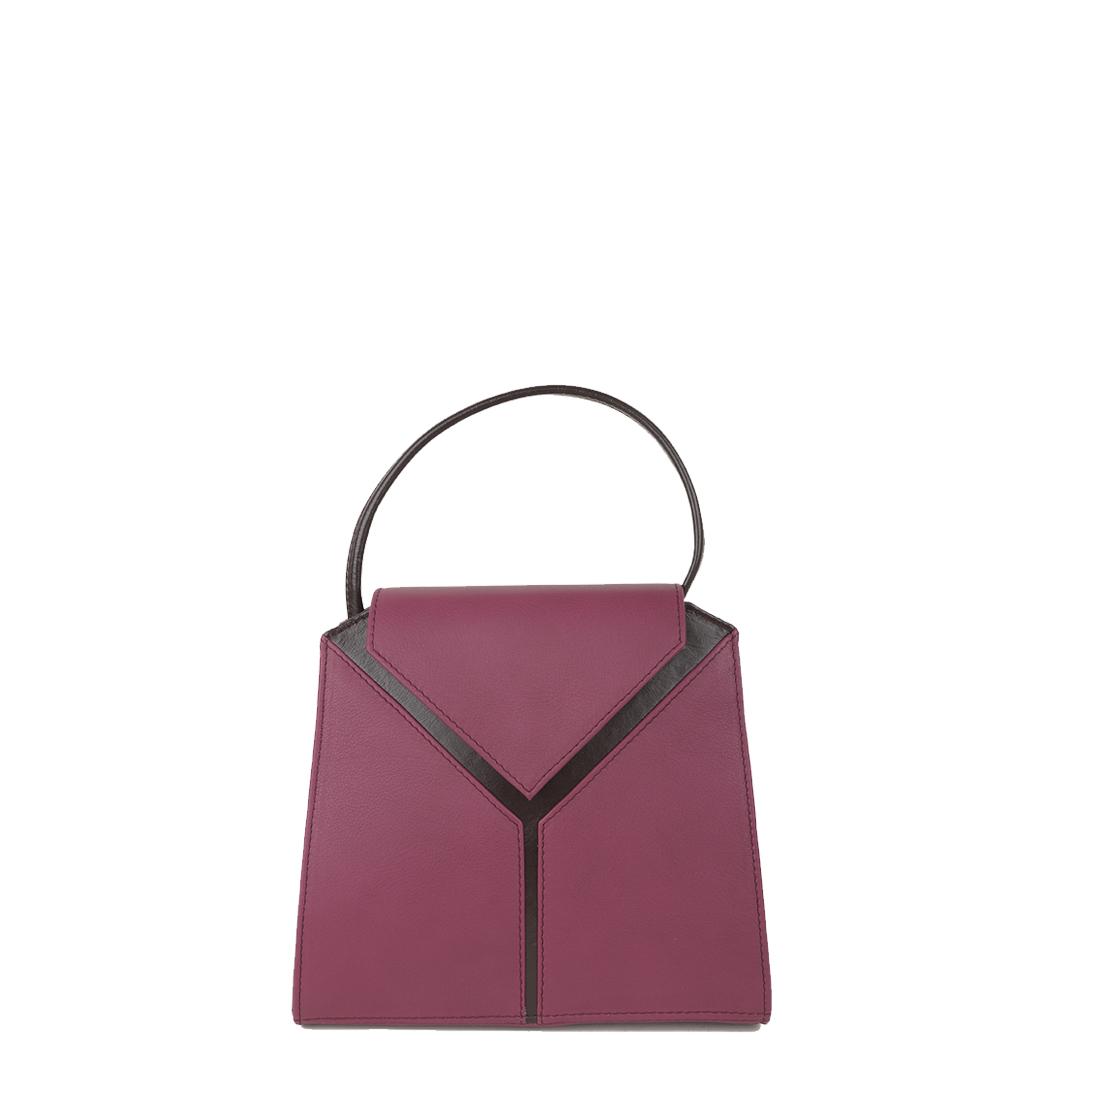 Yasmin Magenta Plum Leather Evening Shoulder Bag